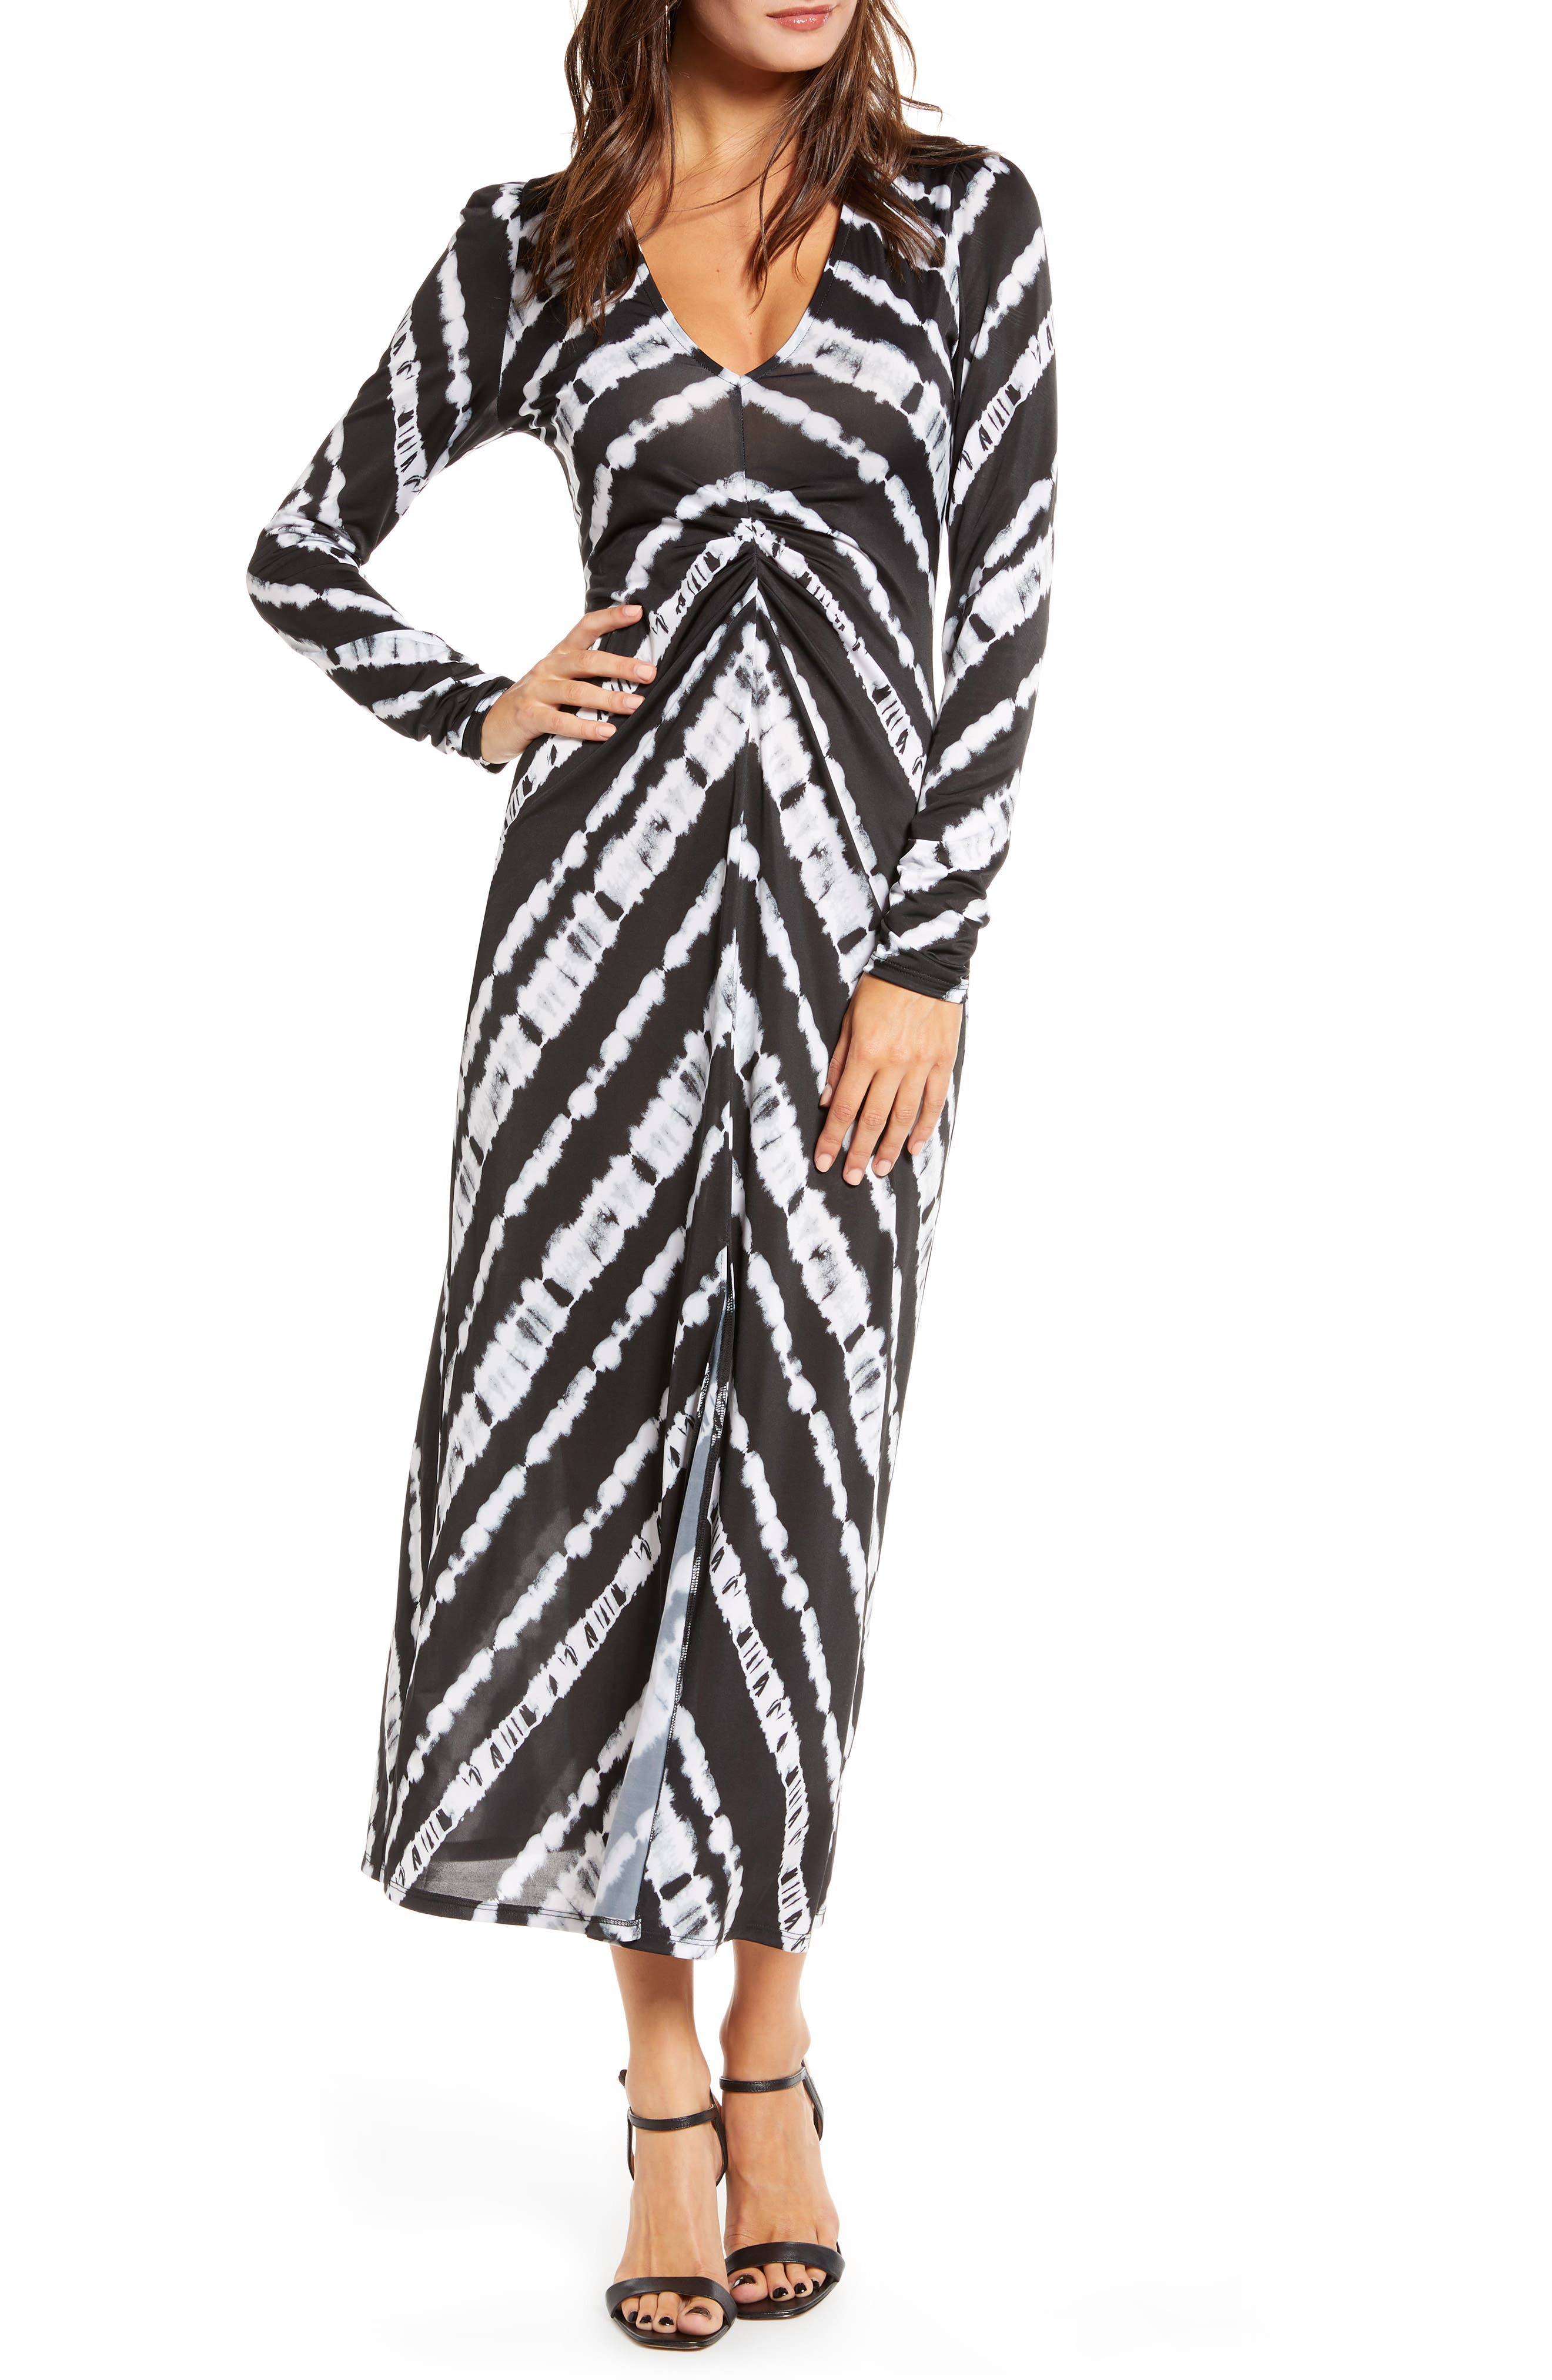 Vintage 1920s Dresses – Where to Buy Womens Afrm Zoey Animal Print Long Sleeve Dress Size Medium - Black $69.00 AT vintagedancer.com